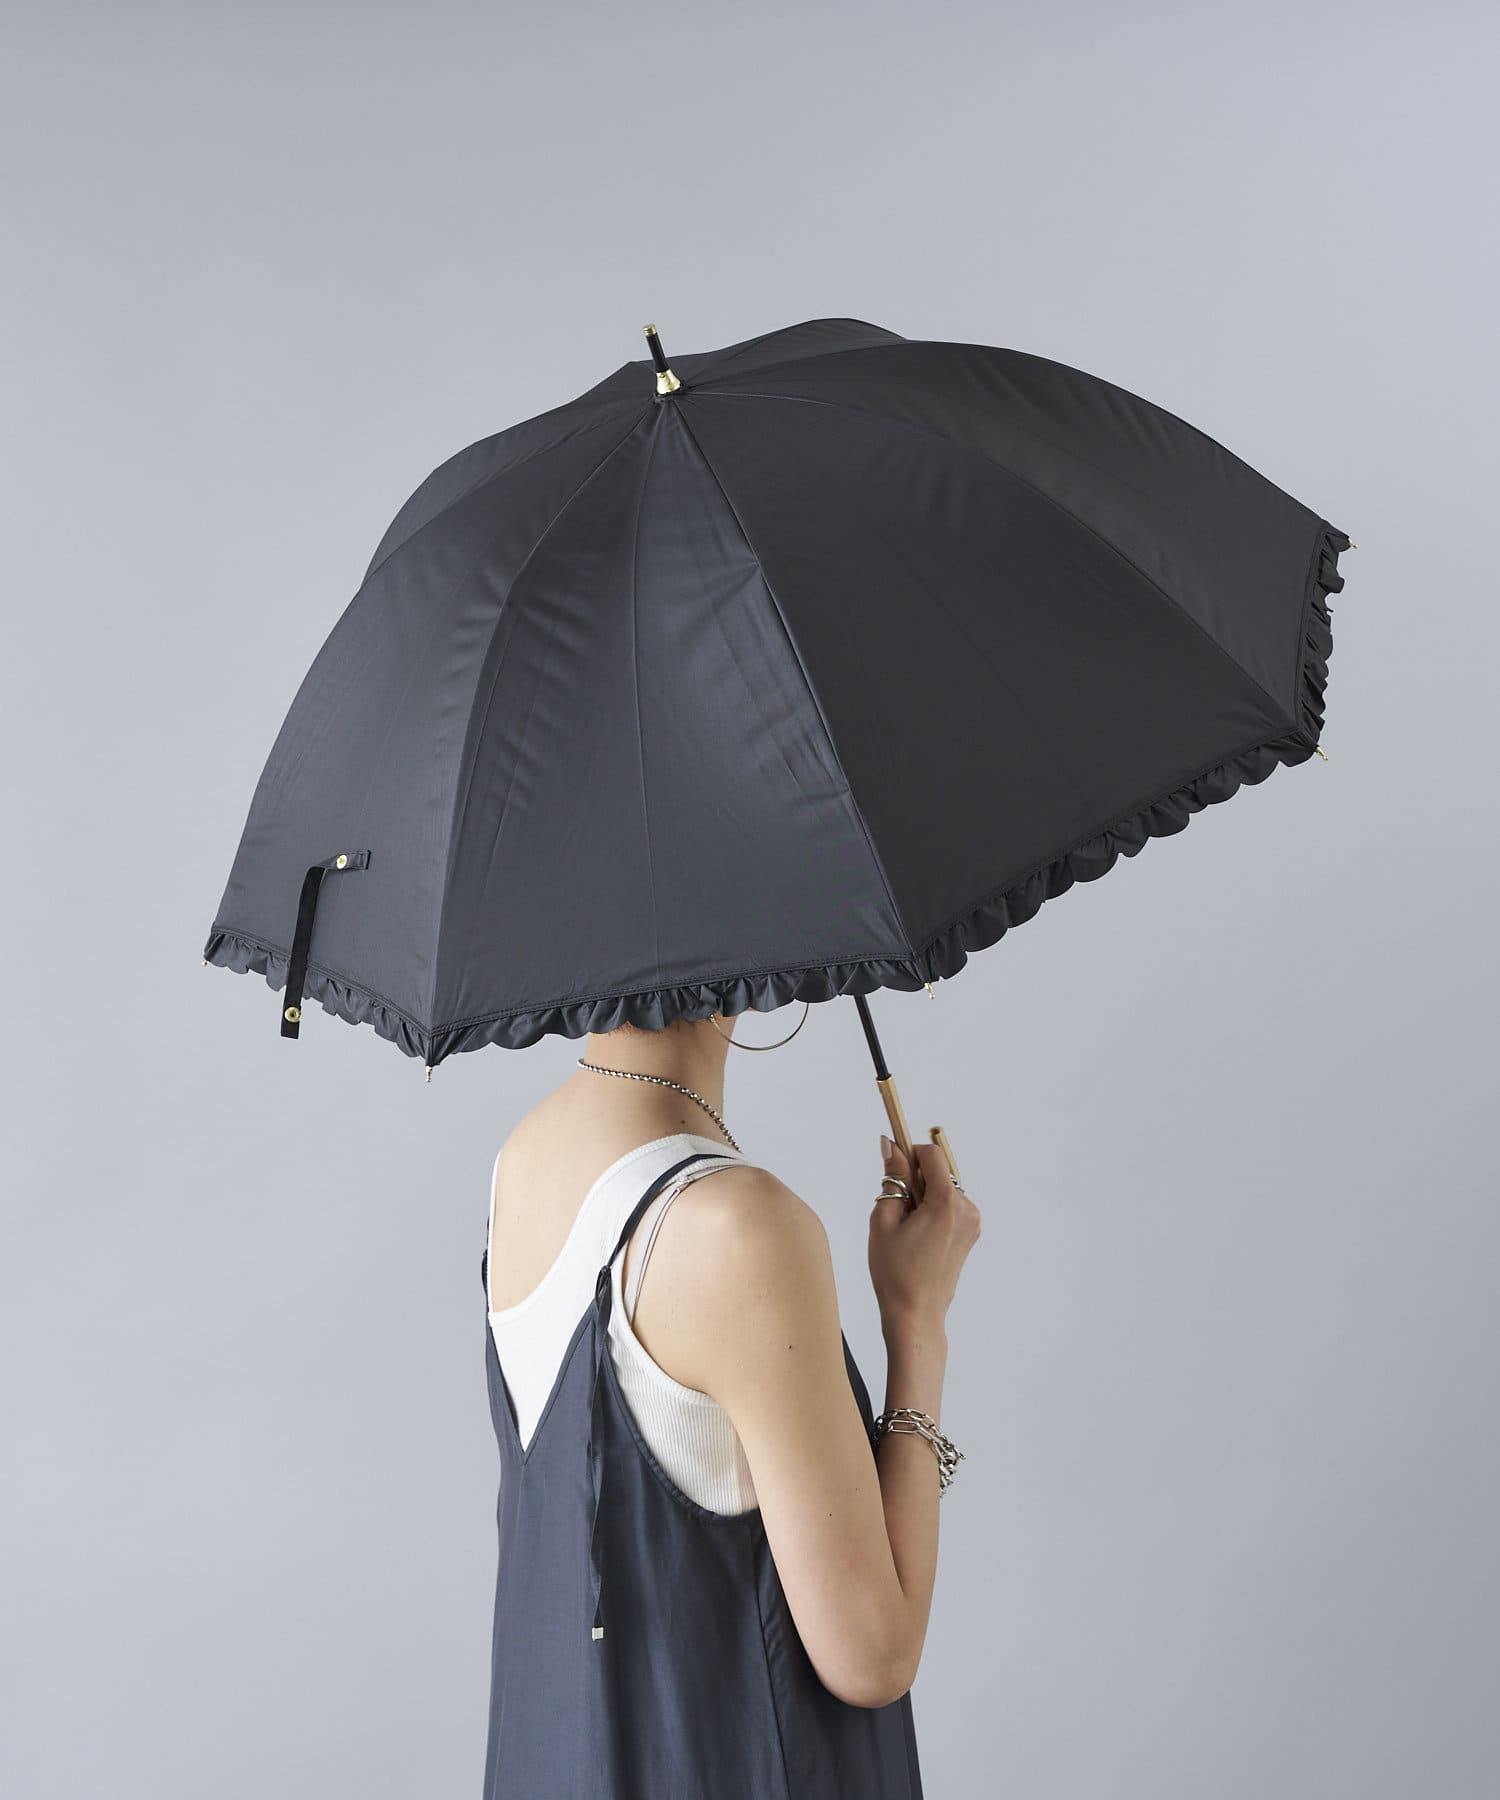 DOUDOU(ドゥドゥ) DOUDOU(ドゥドゥ) 【WEB限定】遮光遮熱 フリルバルーン ブラック